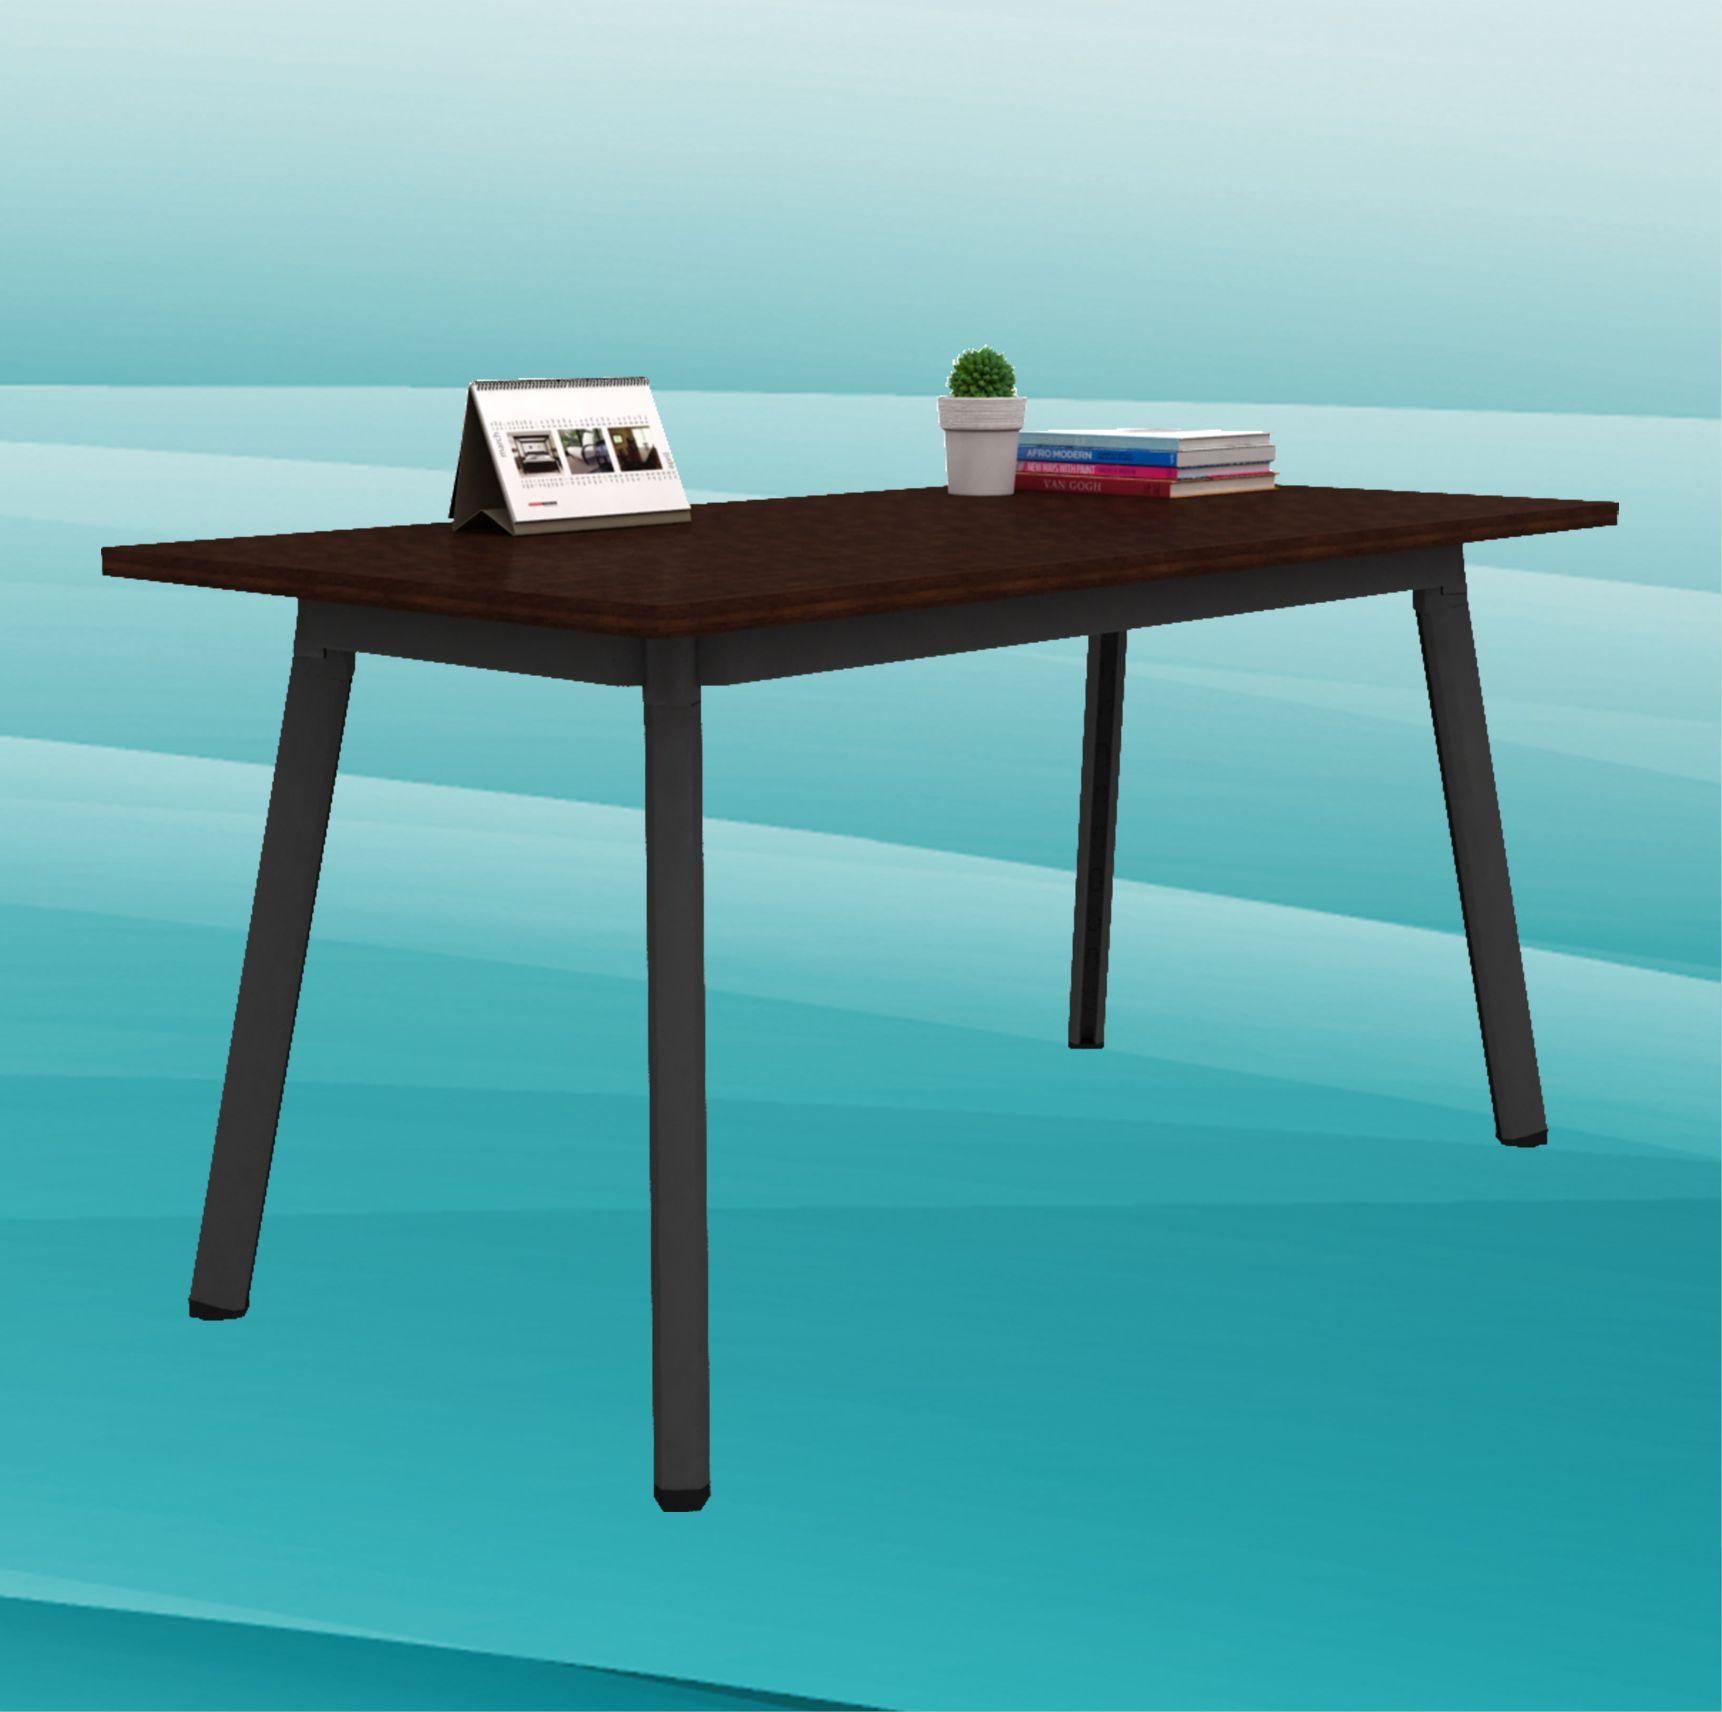 E-STILTS Angle Leg 1500mmL   Table sizes, Study desk ...